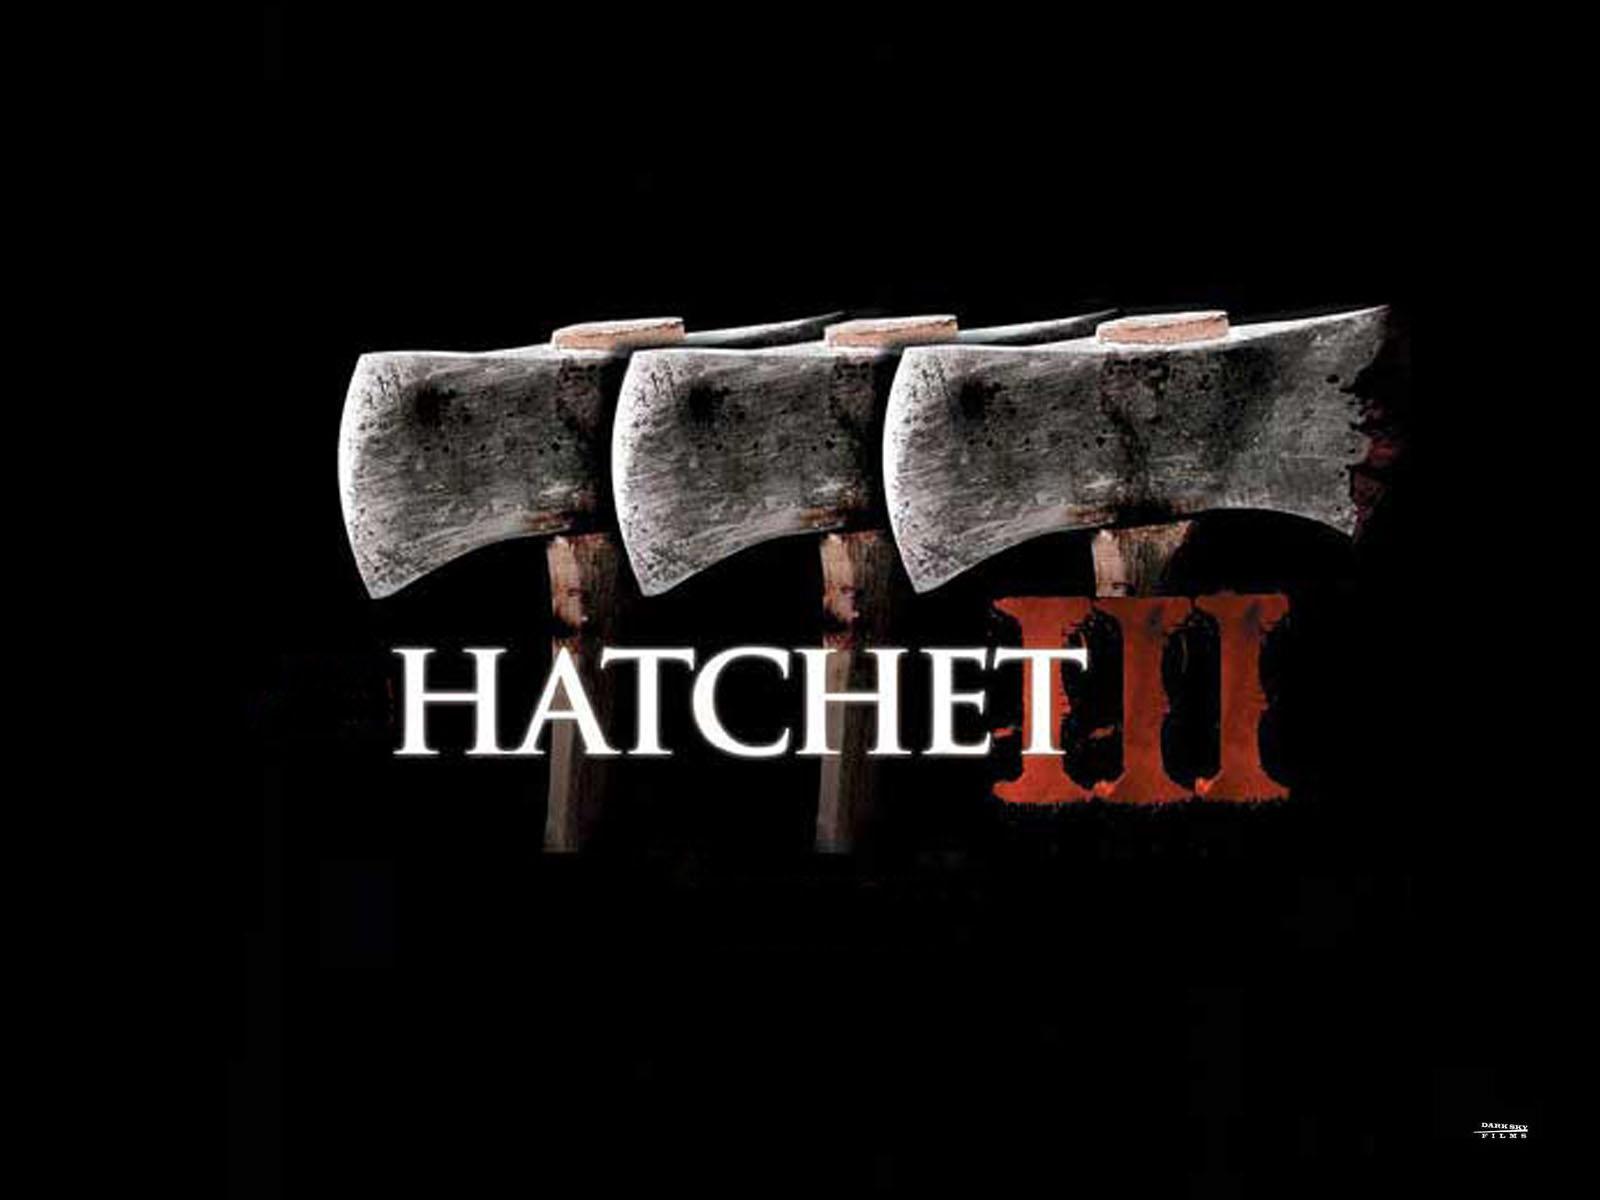 hatchet movie based on book. hatchet iii - poster movie based on book